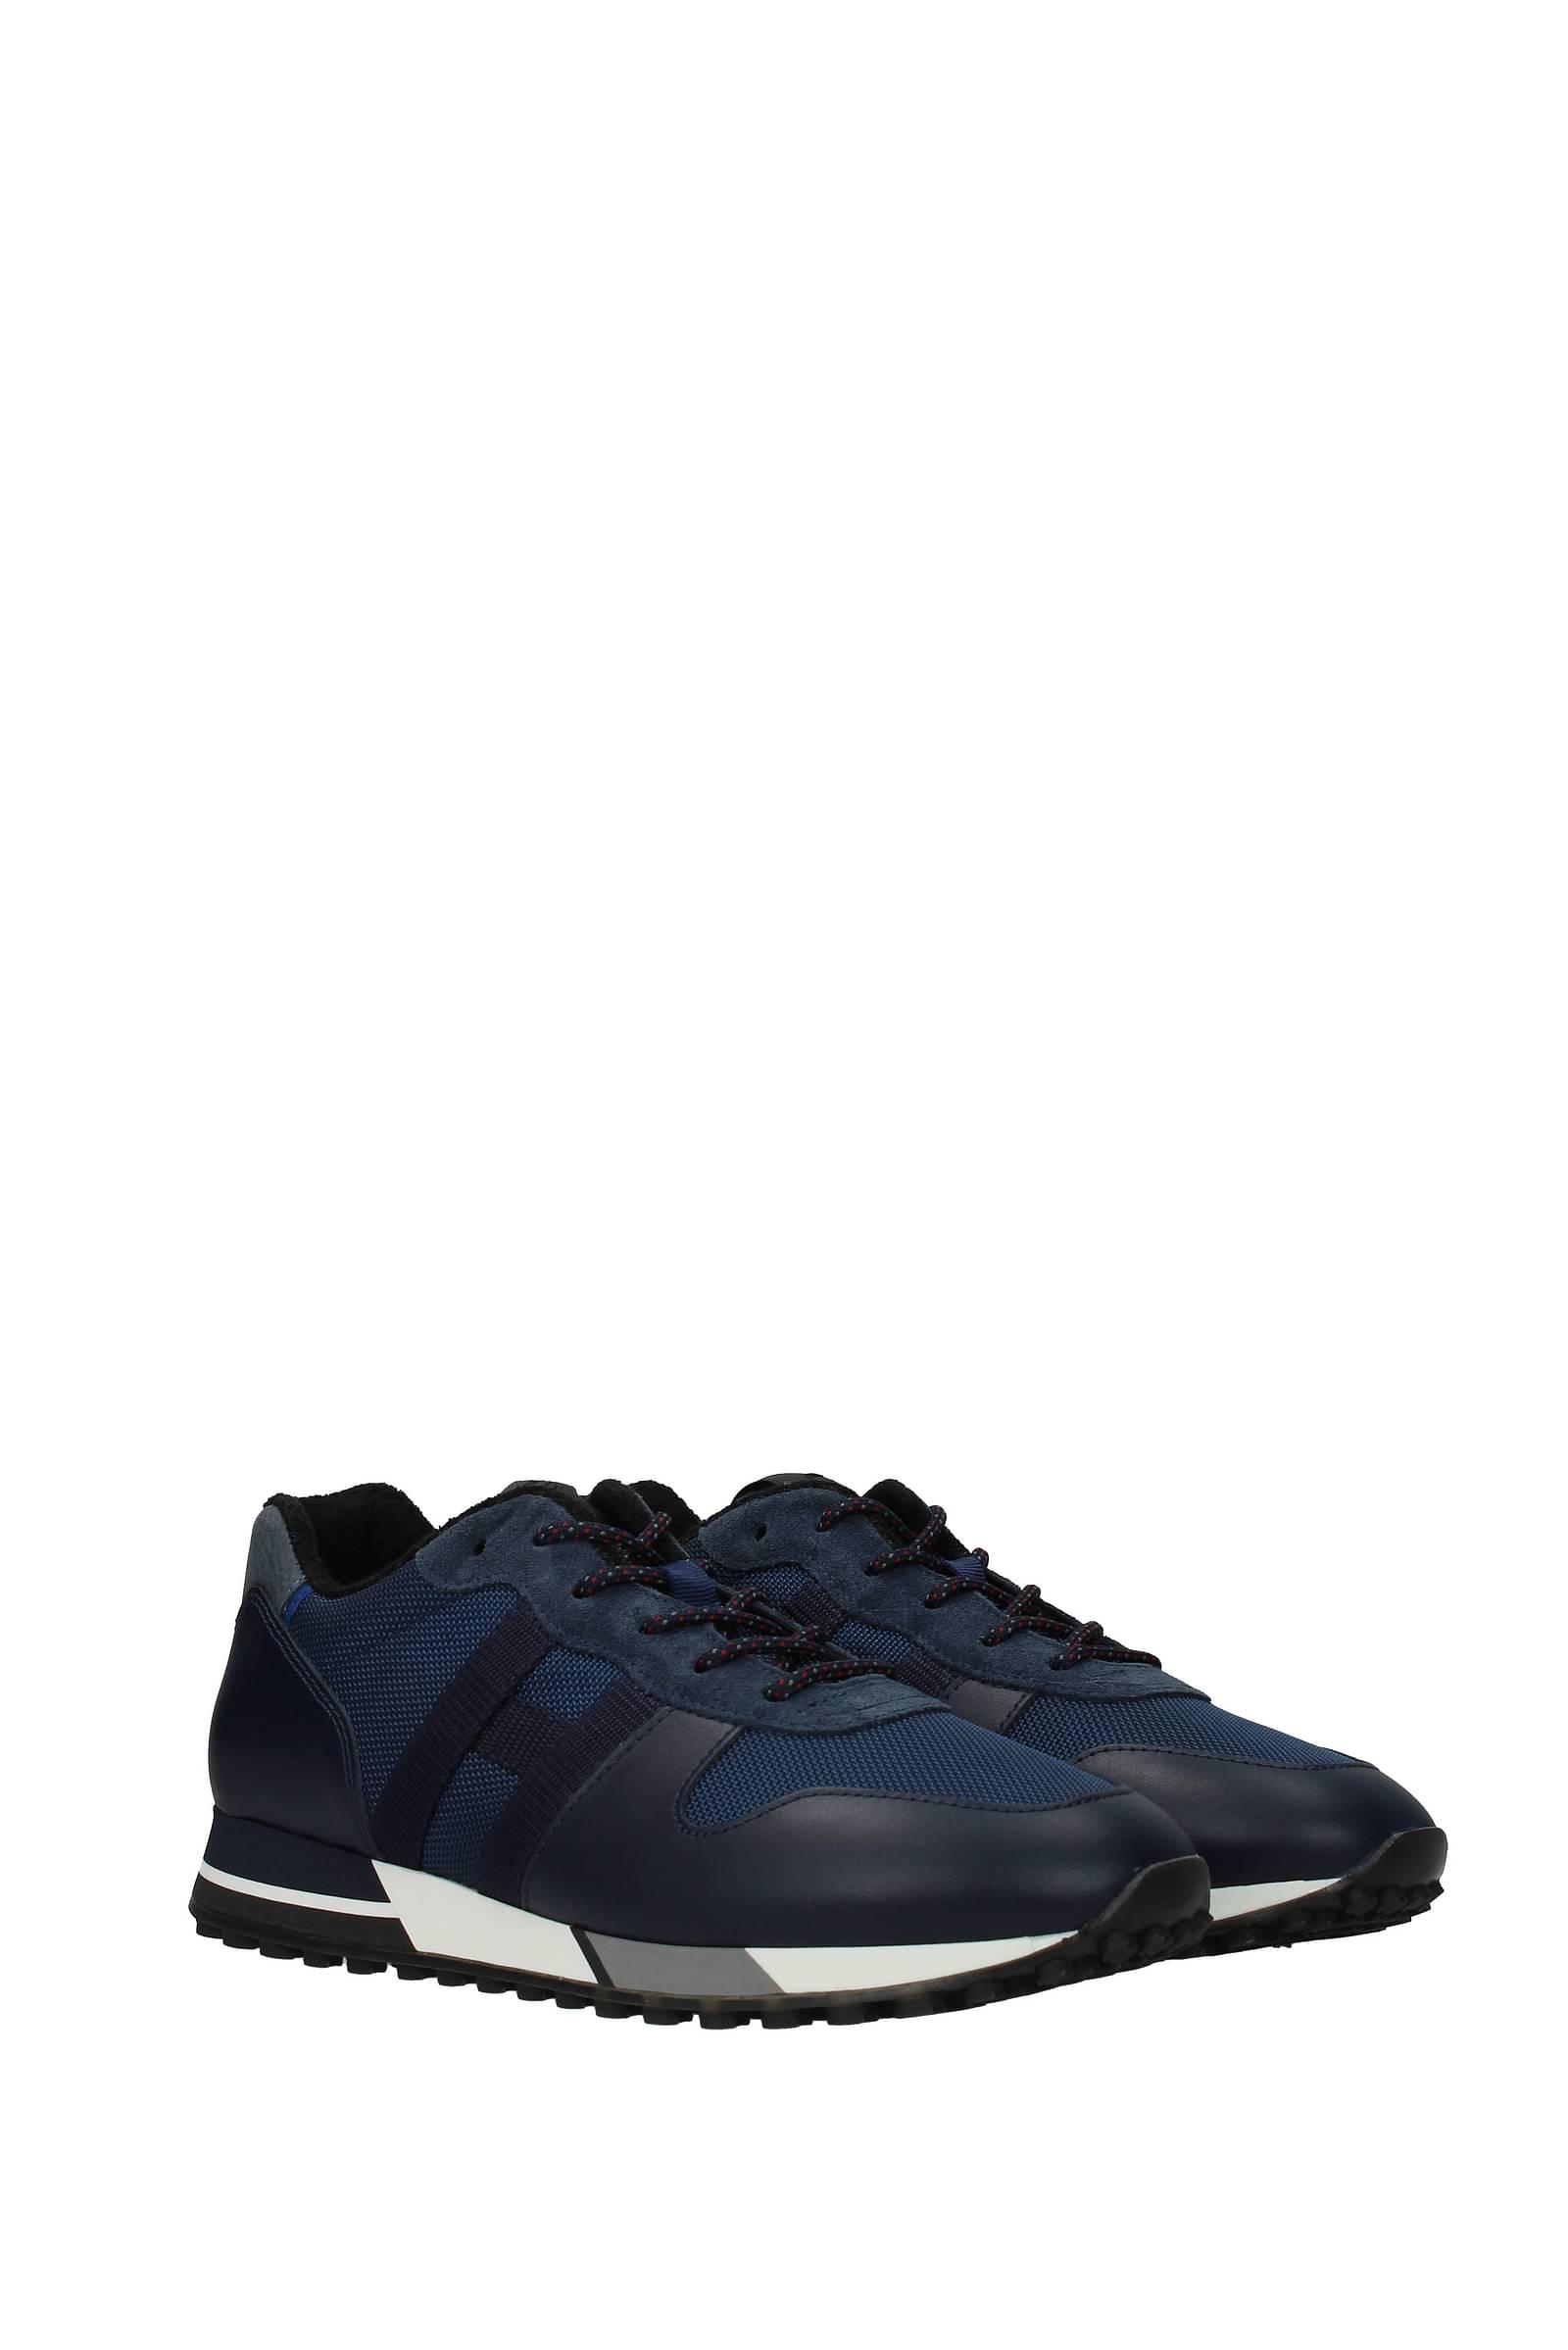 Hogan Sneakers Uomo Tessuto Blu Blu Navy